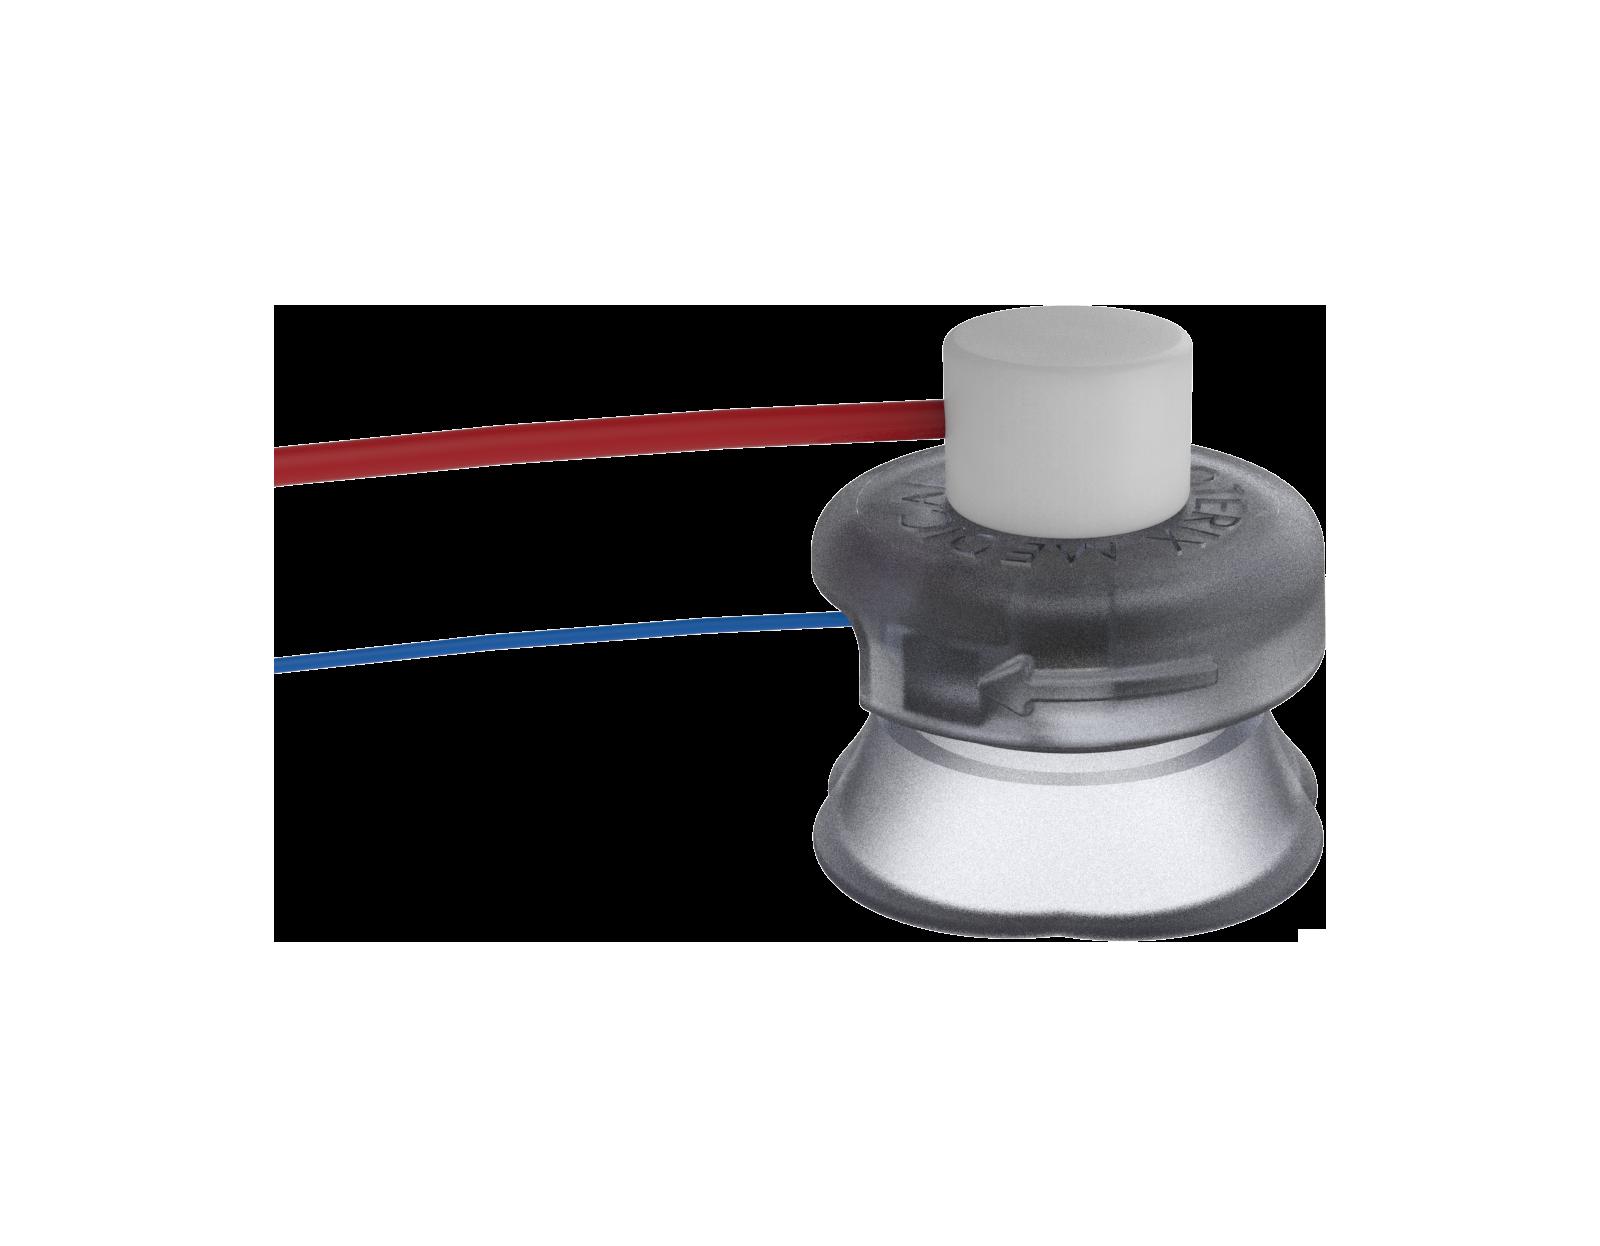 HD-tES + Hybrid Biosemi holder